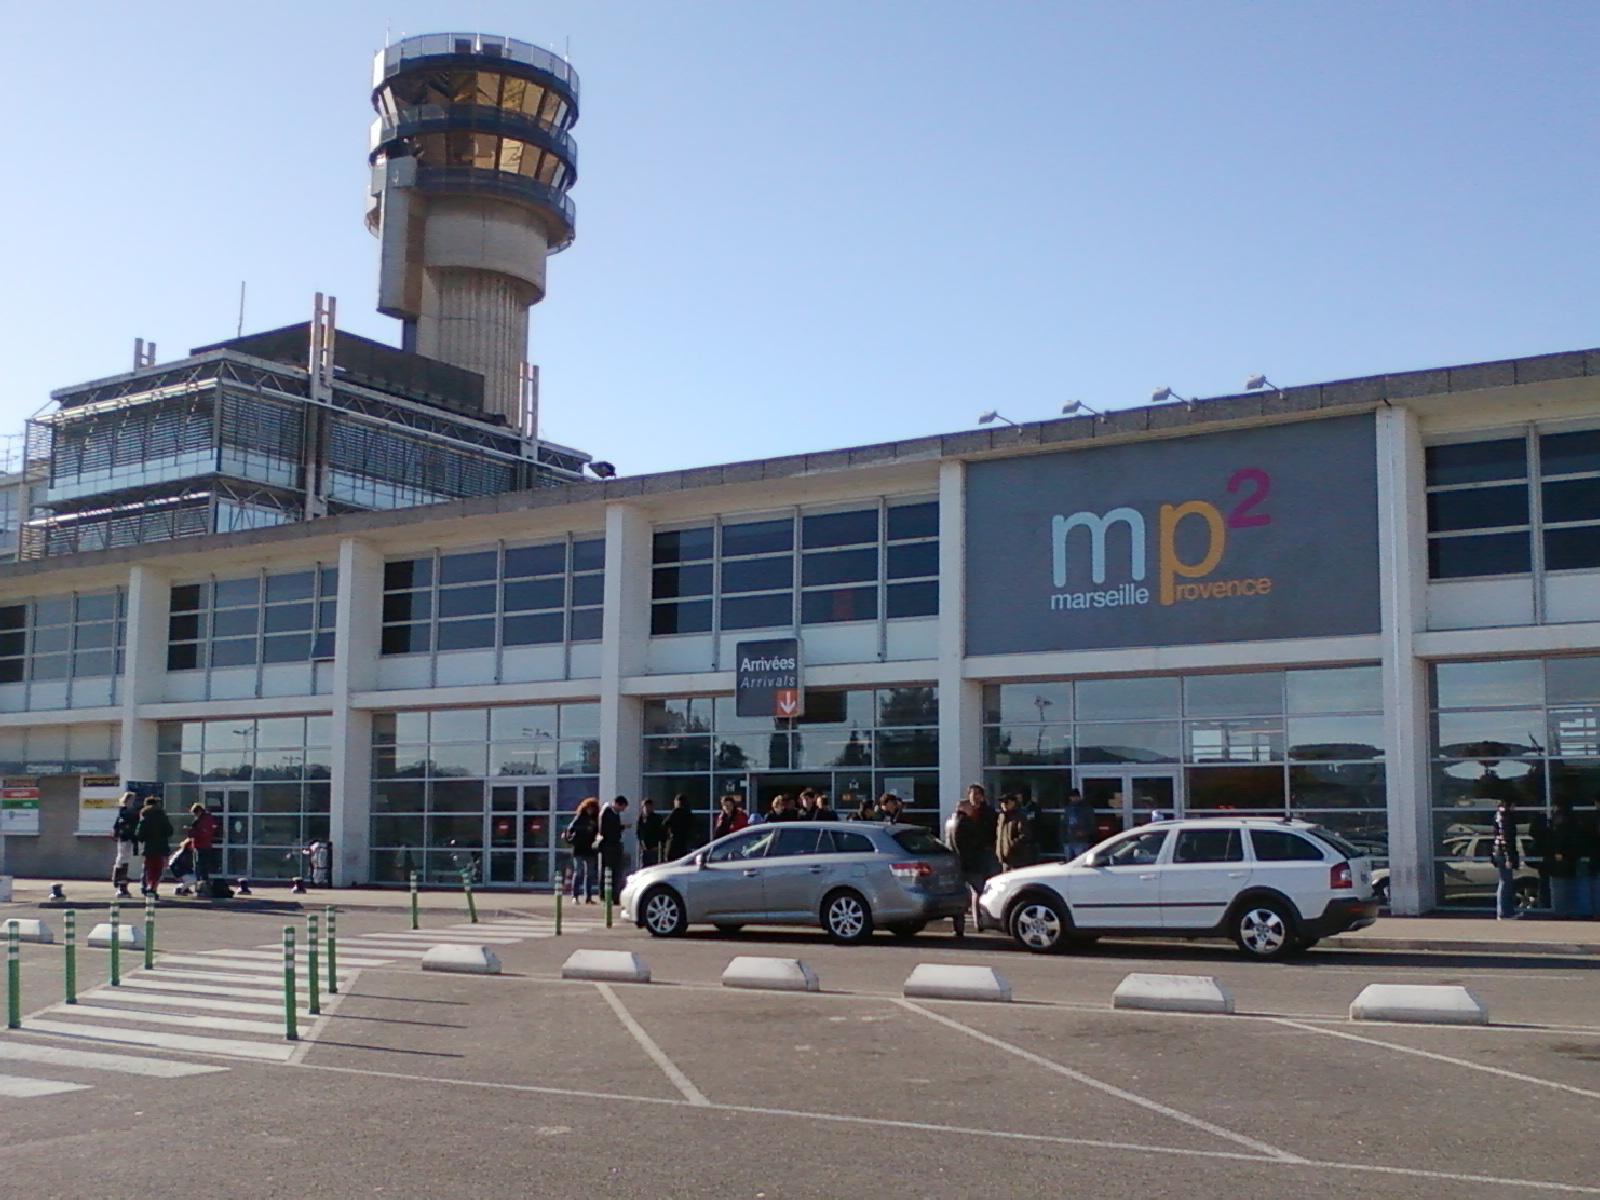 Aéroport Marseille